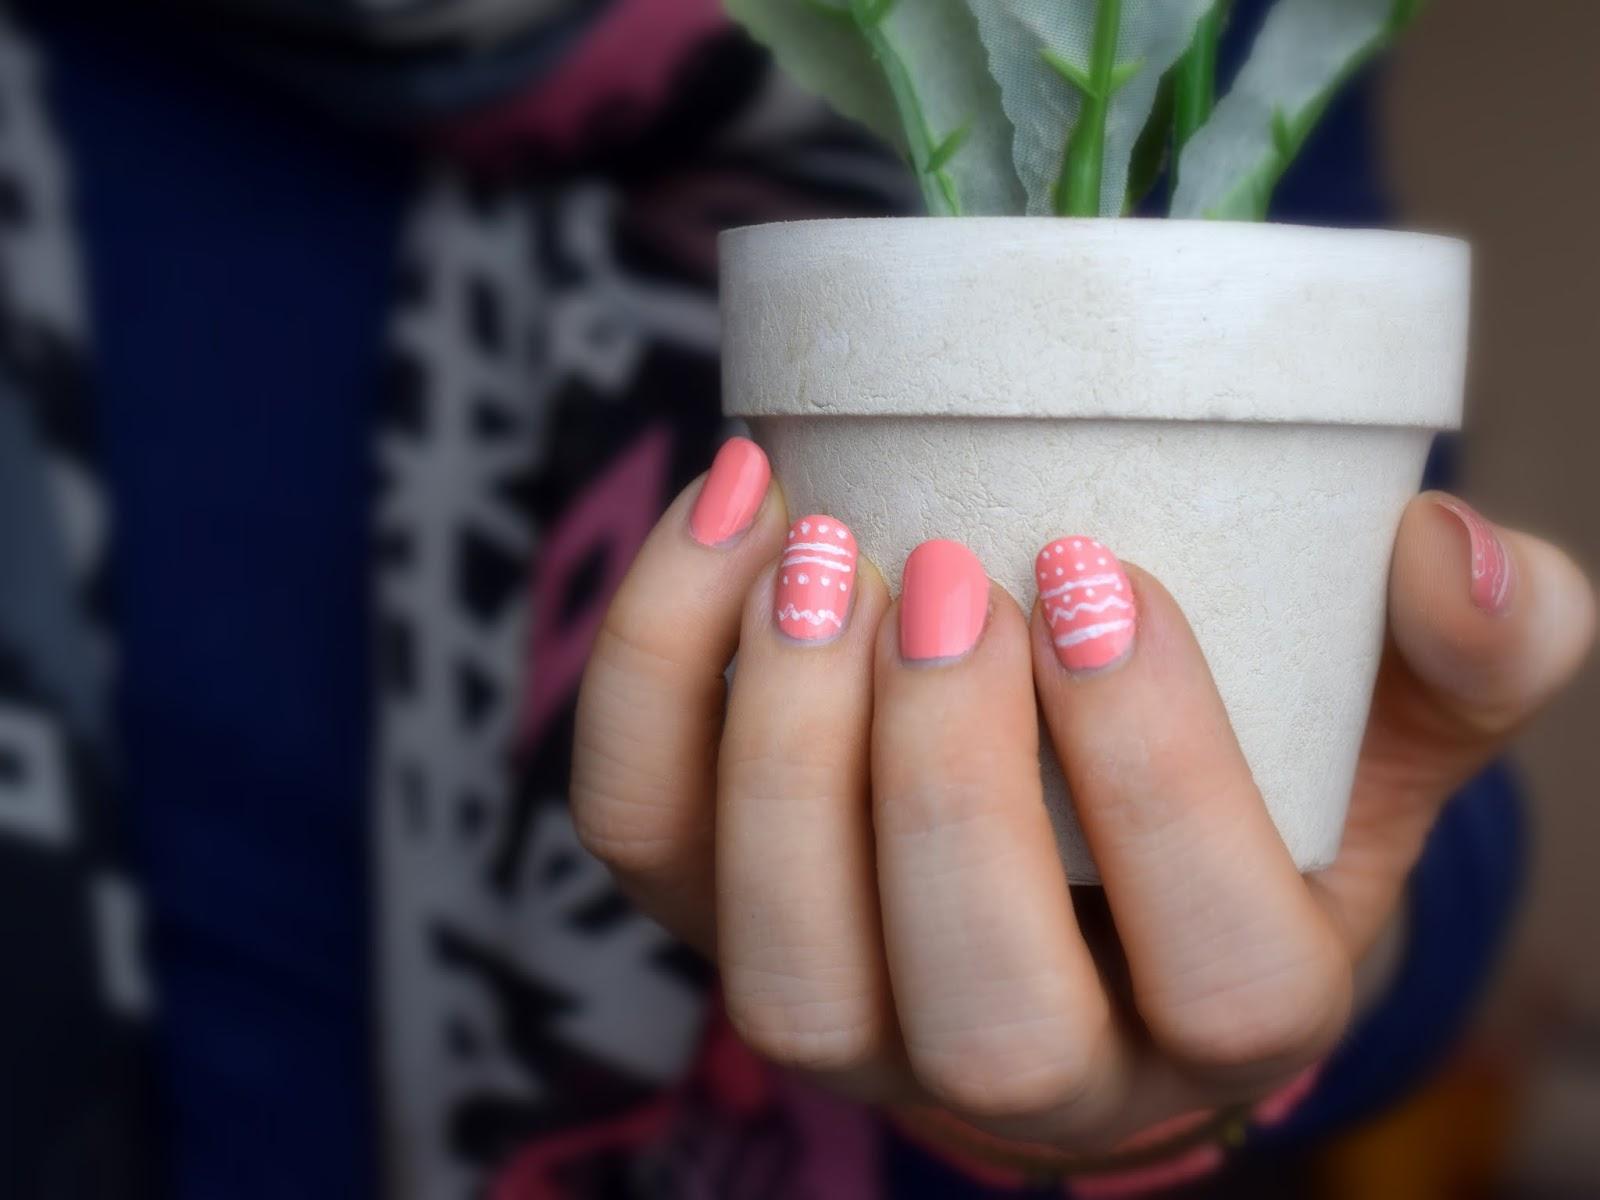 Oster Maniküre mit Catrice A Gallon Of Melon und Maybelline Designer Nail Art Pen White